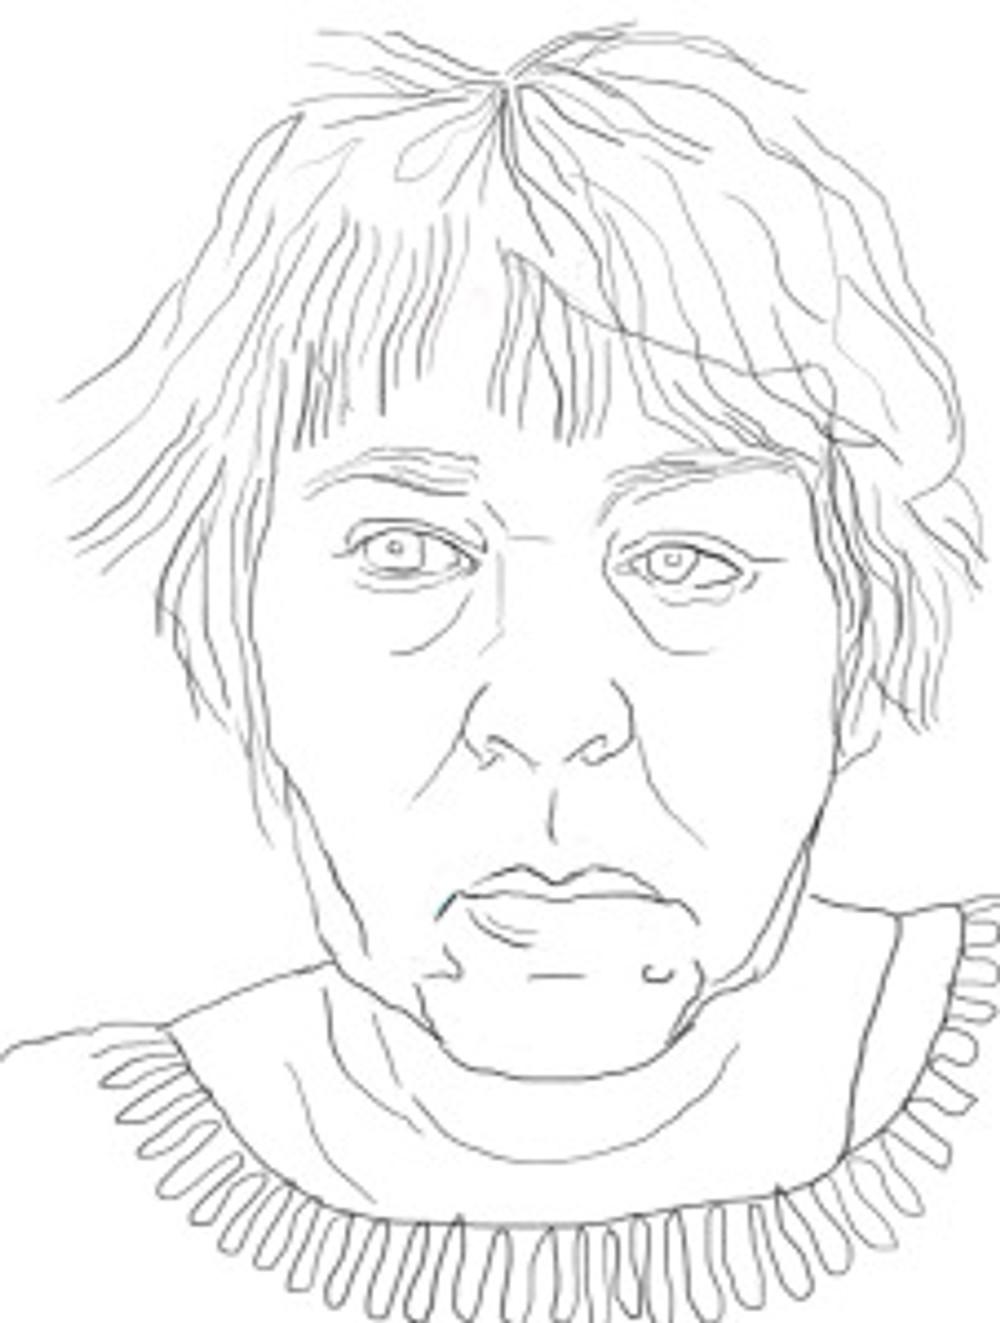 digital drawing